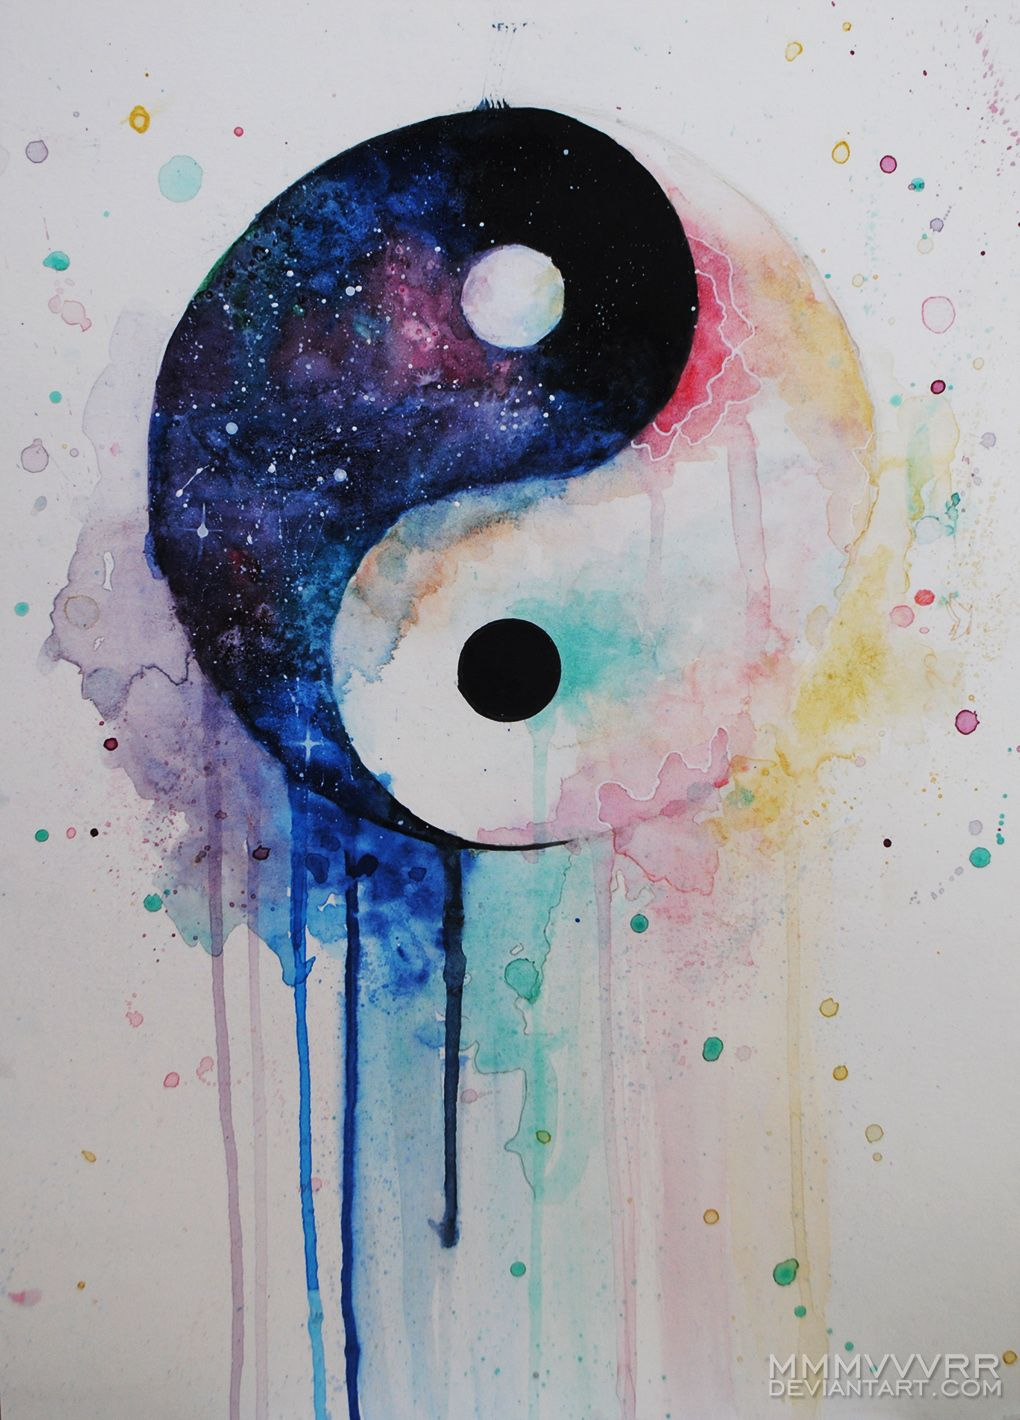 Iphone wallpaper tumblr yin yang - Resultado De Imagen Para Yin Yang Acuarela